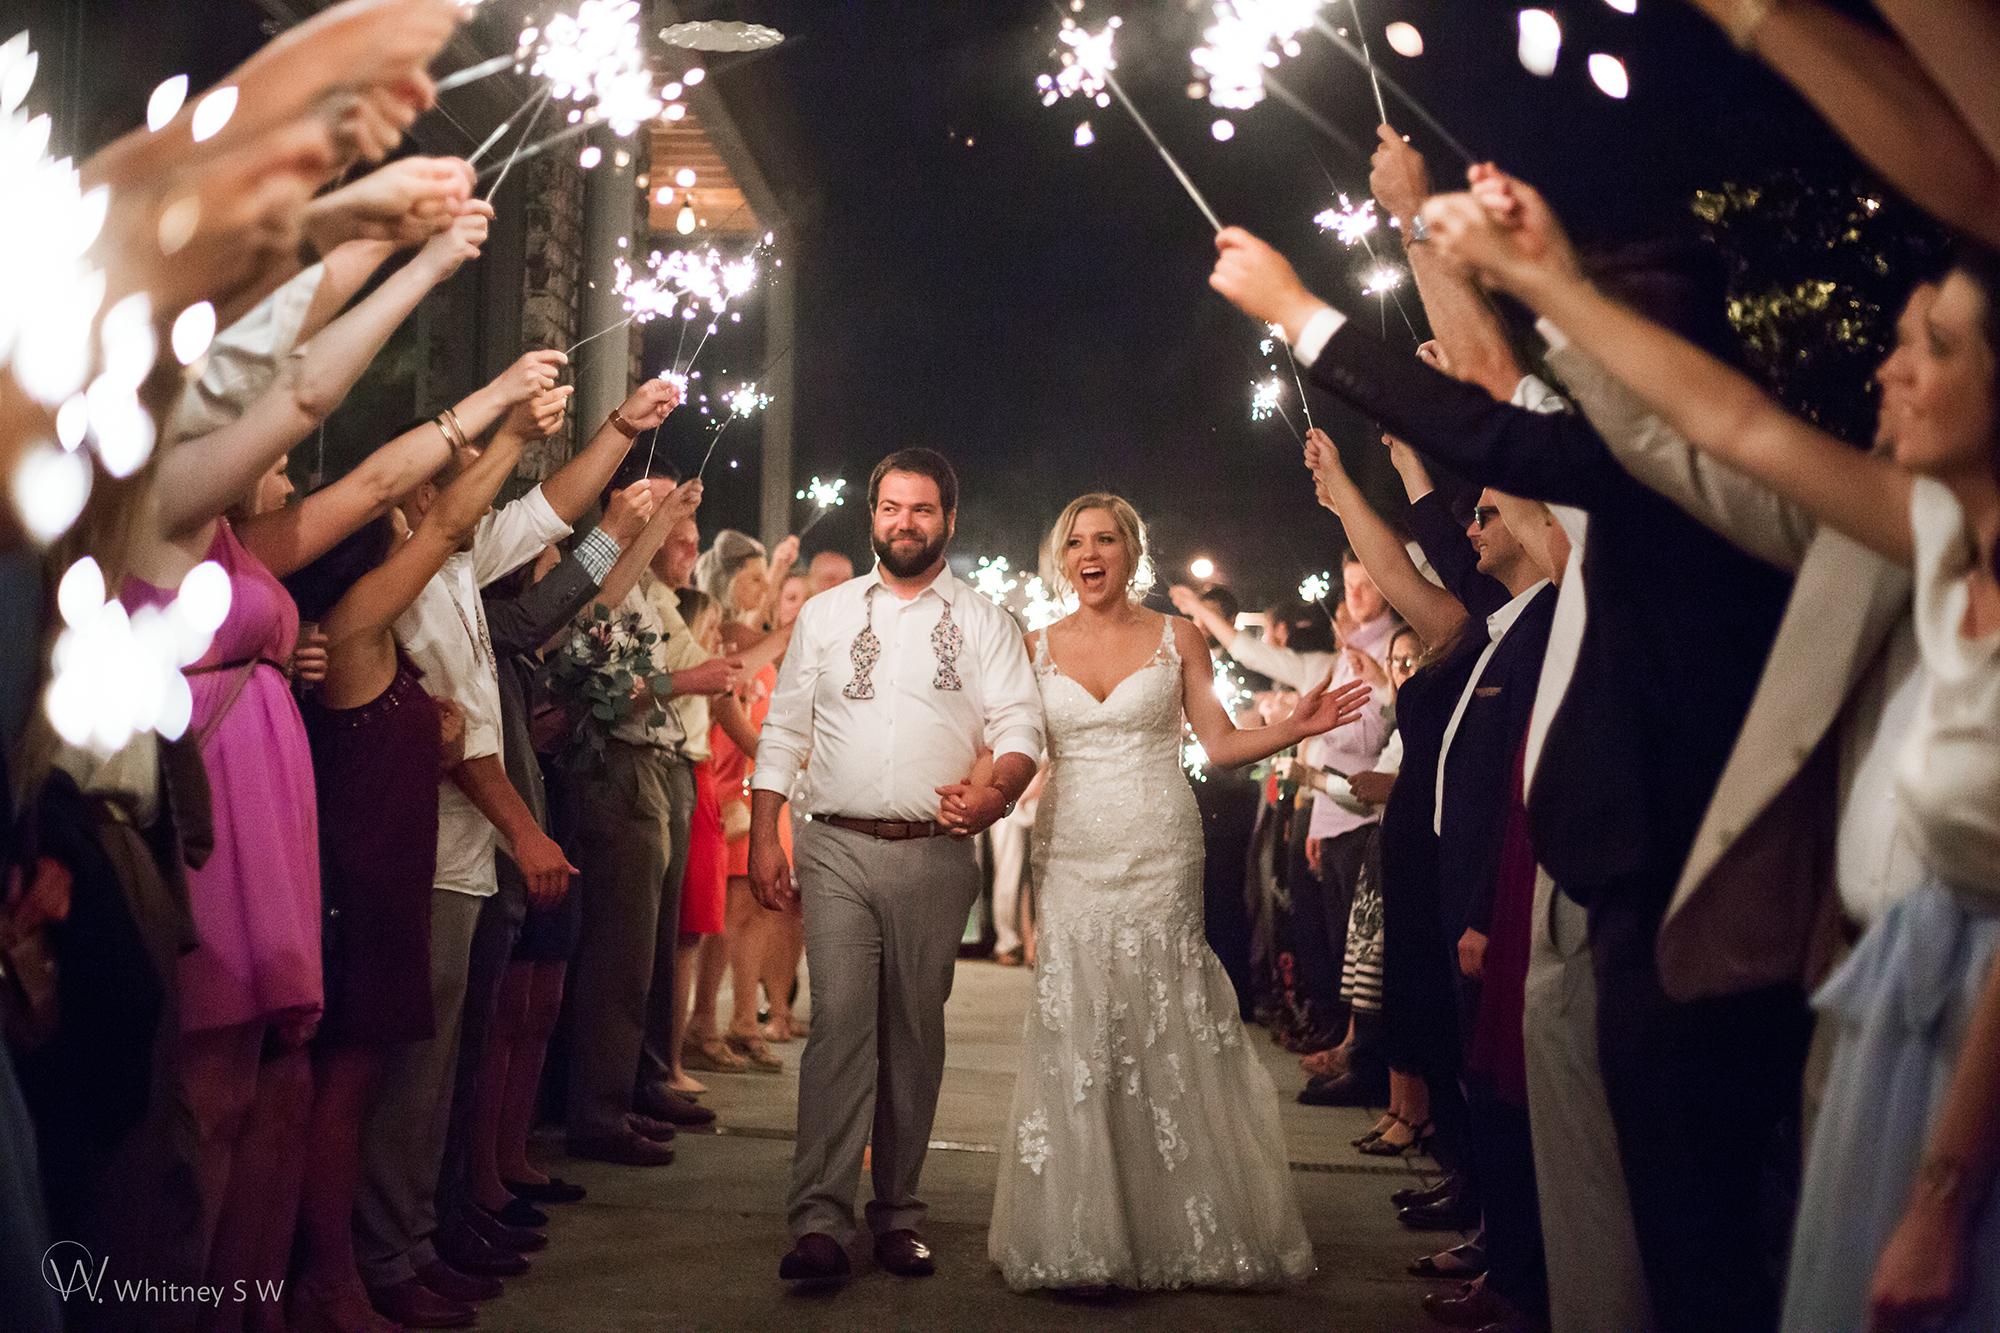 Morgan & Kaivon Wedding - Photography by Whitney S Williams whitneysw (49).jpg